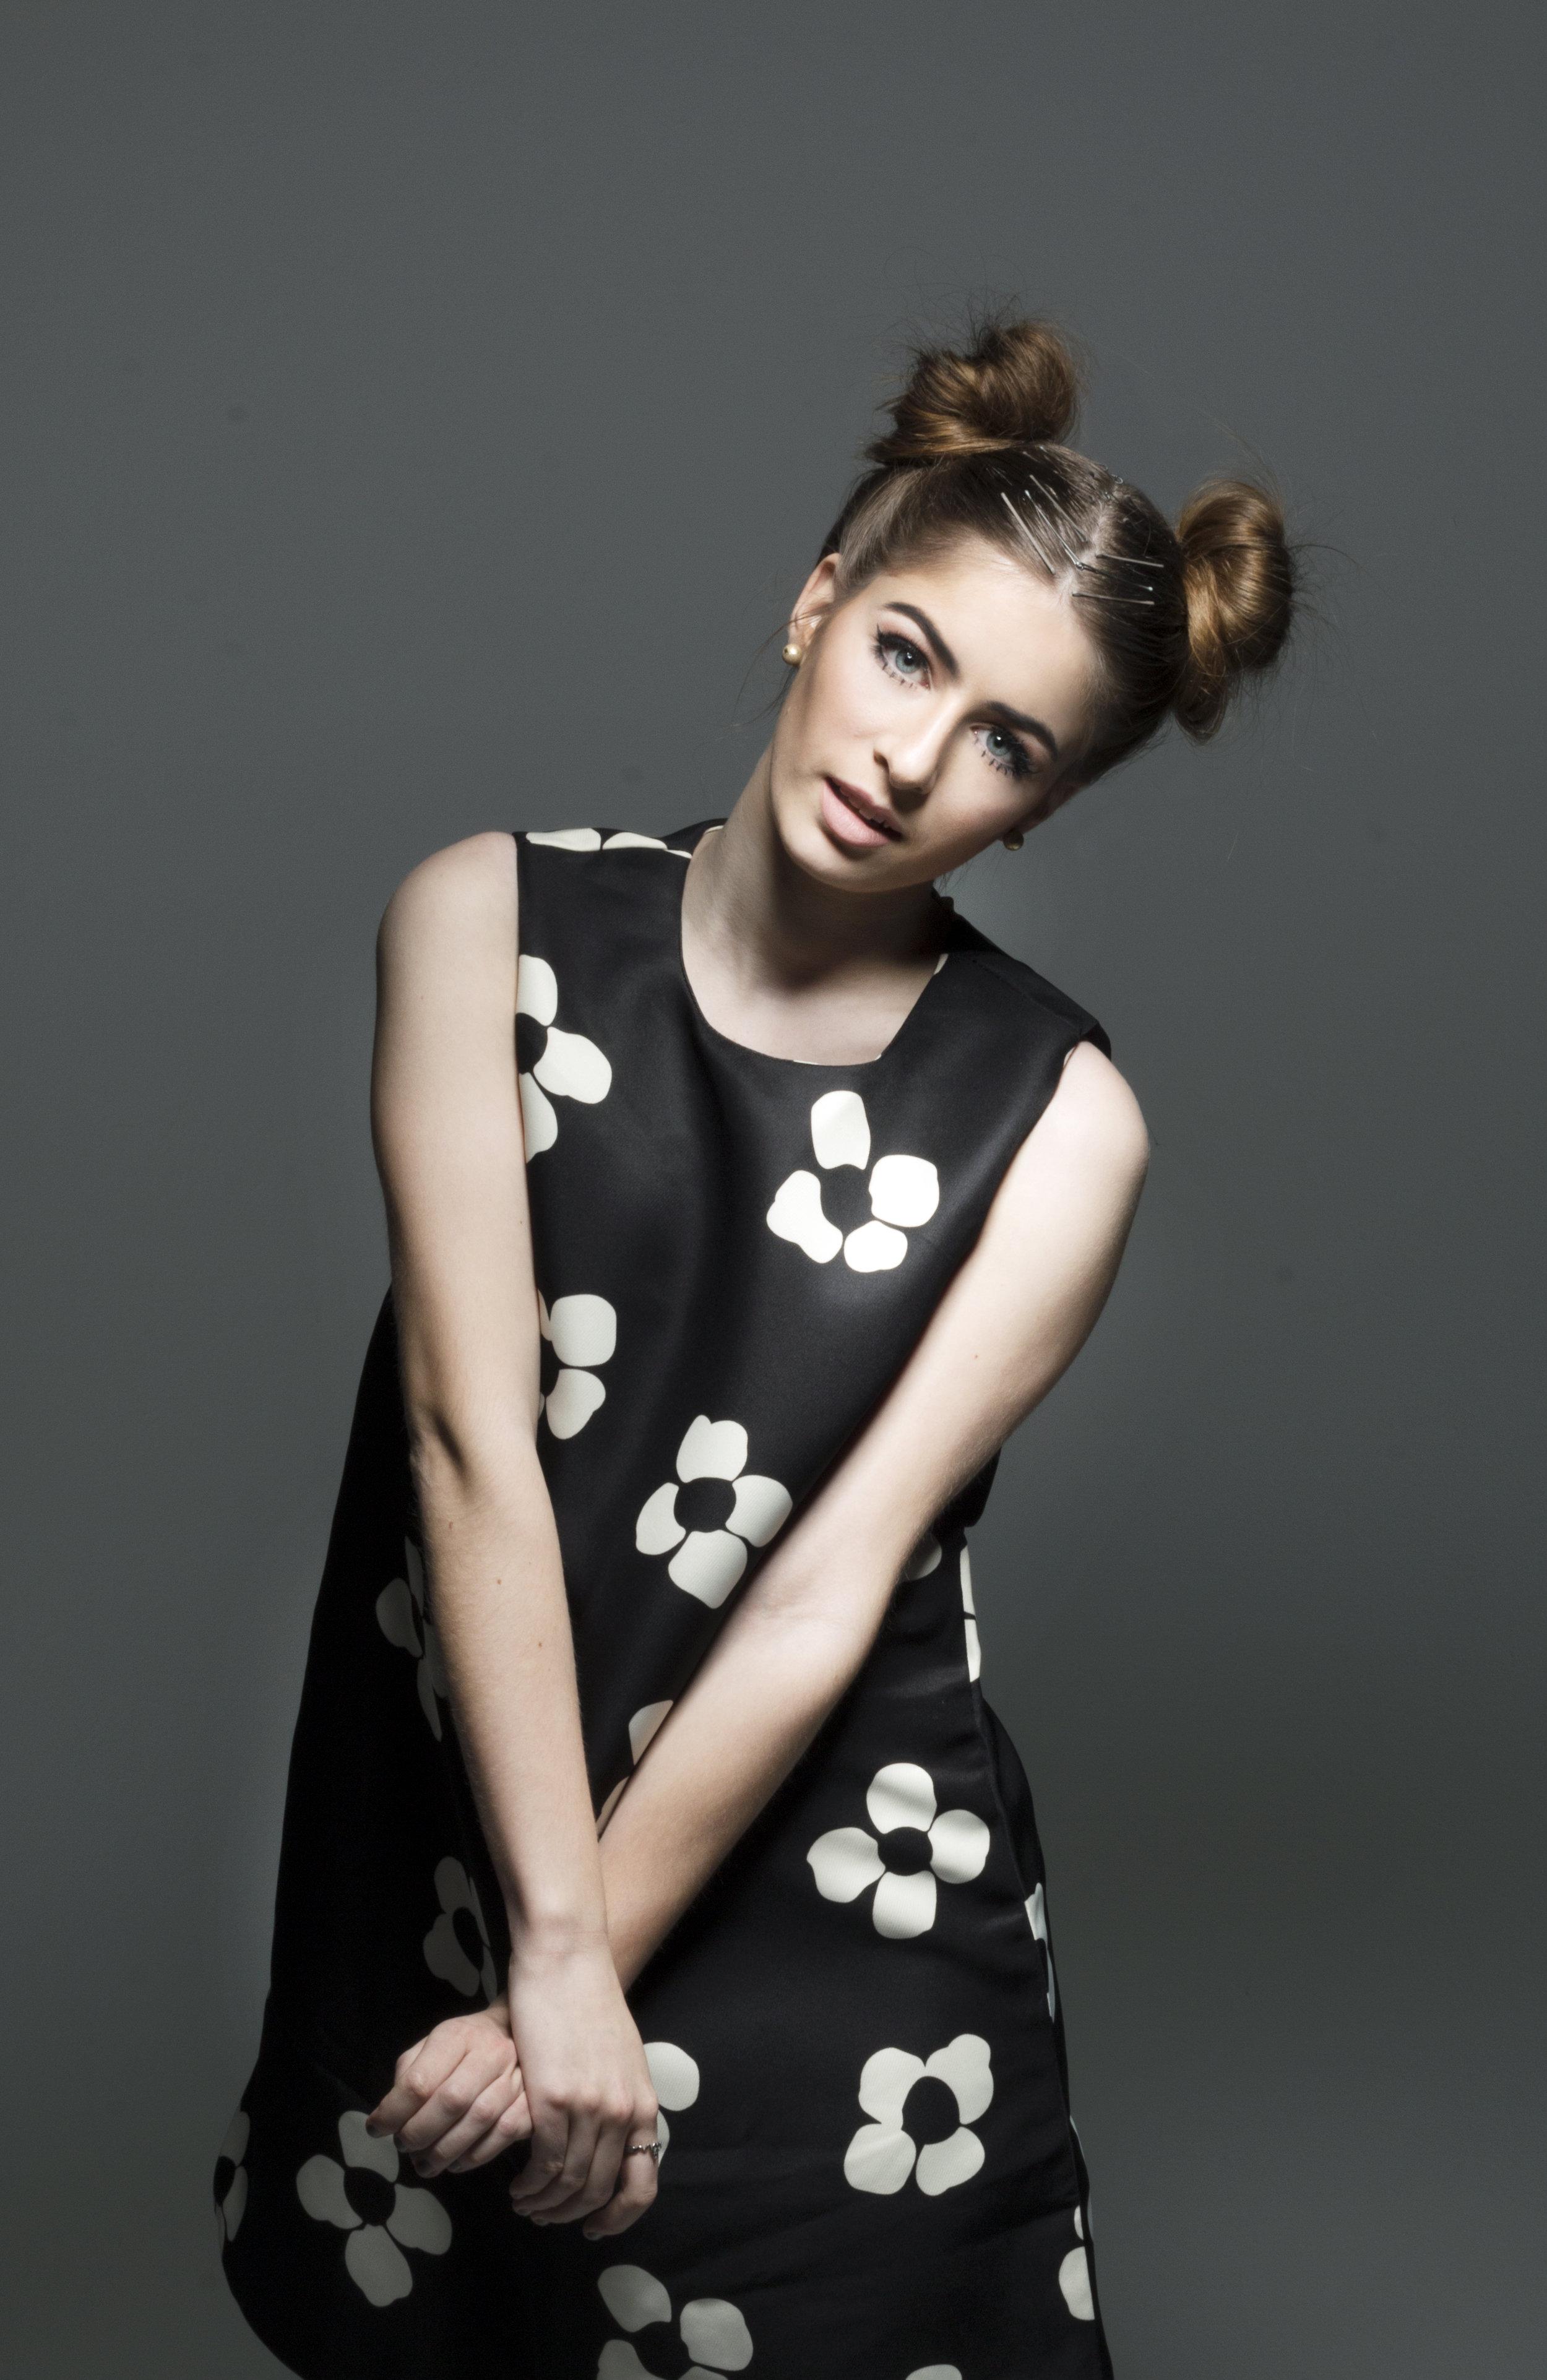 Twiggy Inspired - Model: Kirsten LeslieMakeup: MePhotographer: John ReesHair: Makenzie GuzzoDesigner: Cosmic Wolf Vintage